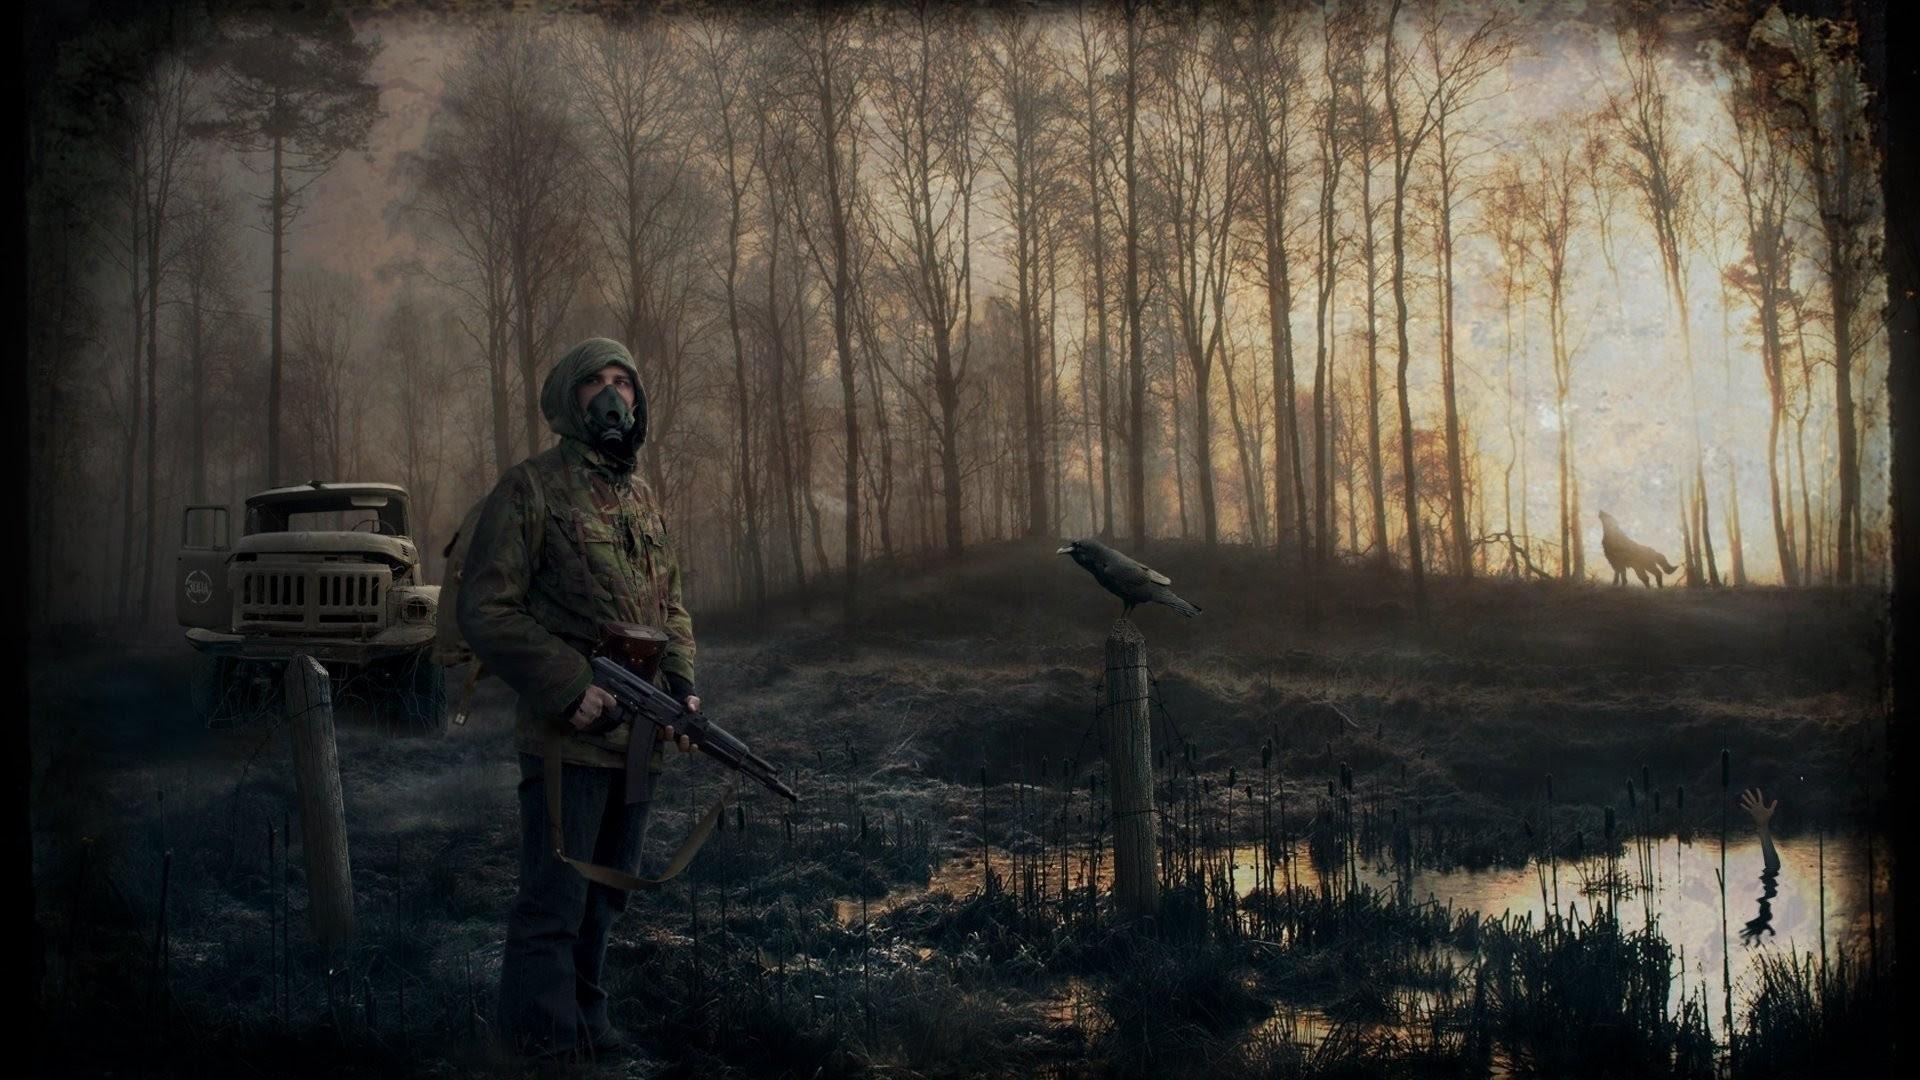 Zombie Apocalypse Wallpaper HD (76+ images)